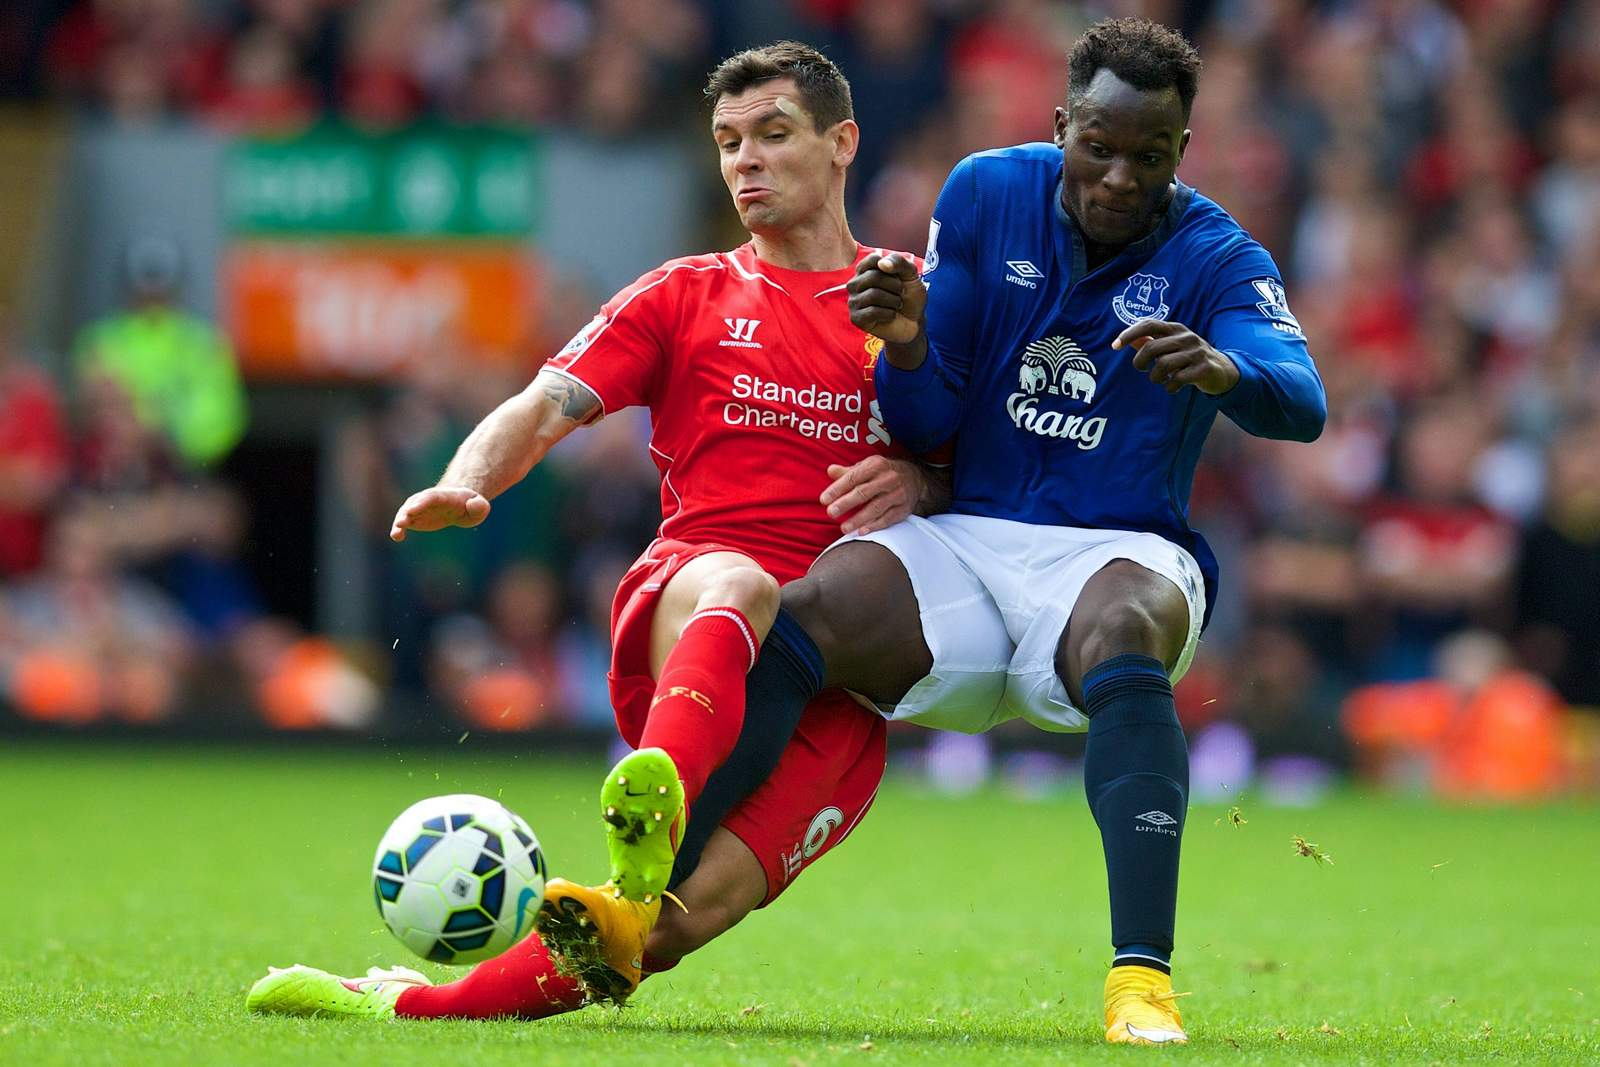 Dejan Lovren grätscht gegen Romelu Lukaku. Jetzt auf Everton gegen Liverpool wetten!